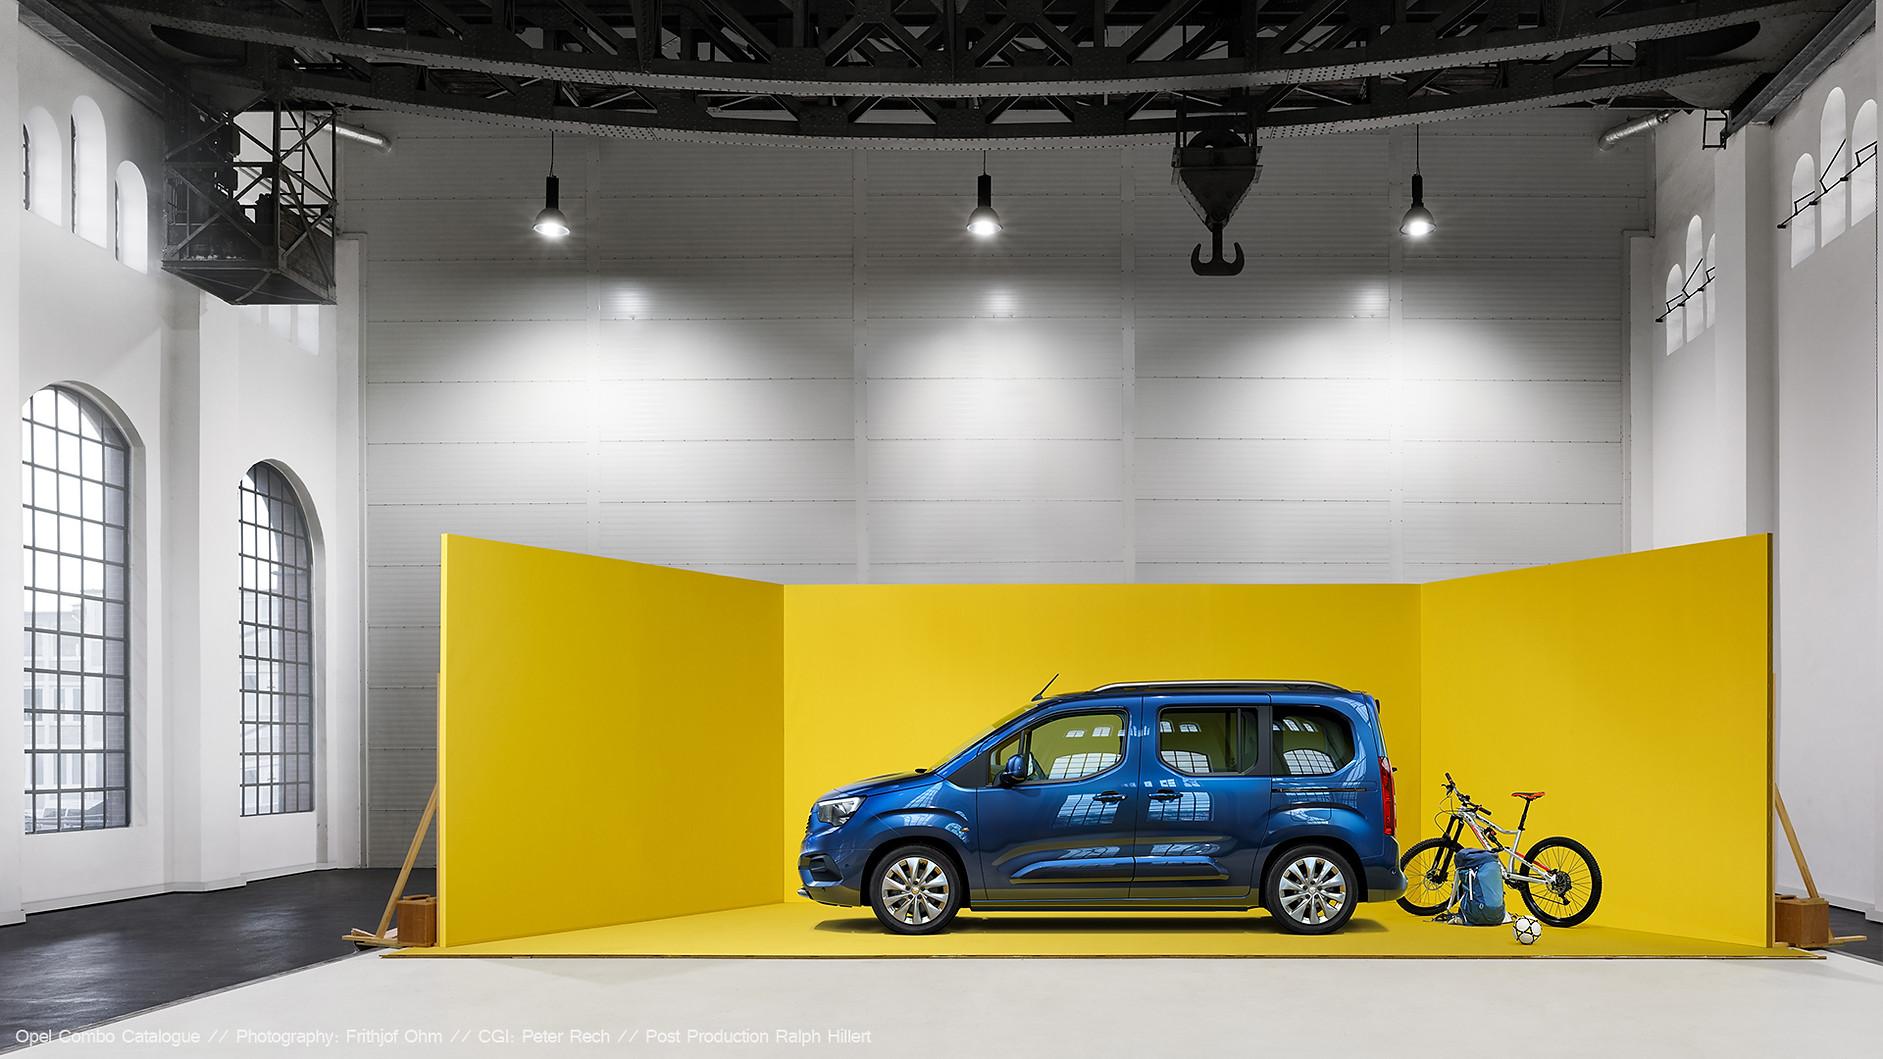 Opel_Combo_Katalog_06.jpg